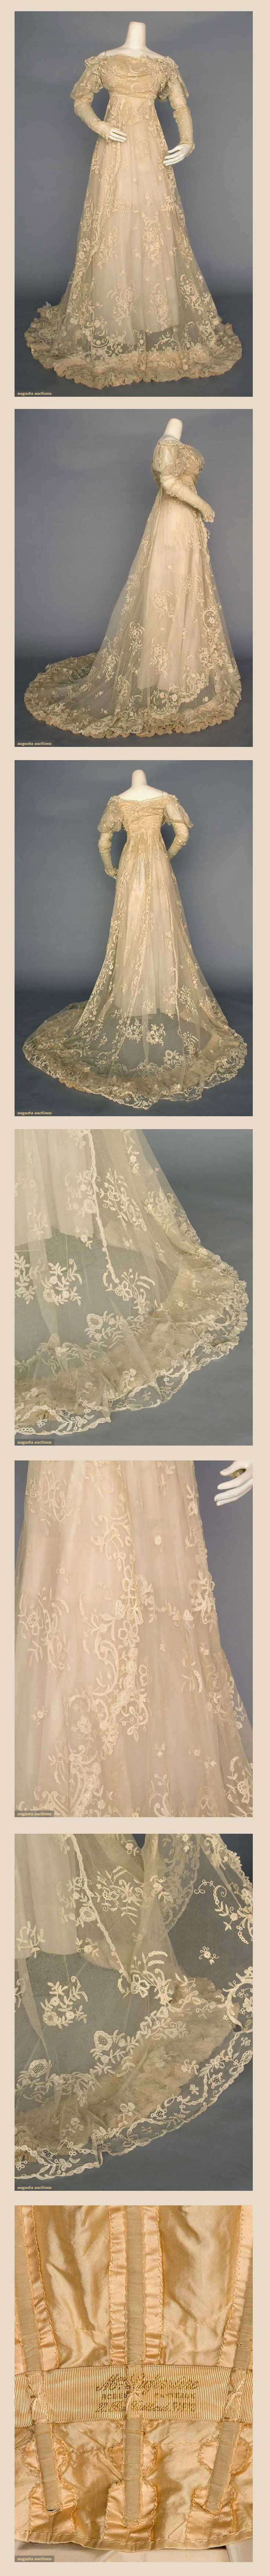 LACE WEDDING GOWN, Paris, circa 1910  Ecru cotton net w/Brussels lace applique, 1-piece, empire, trained skirt, Petersham stamped. Via Augusta Auctions.